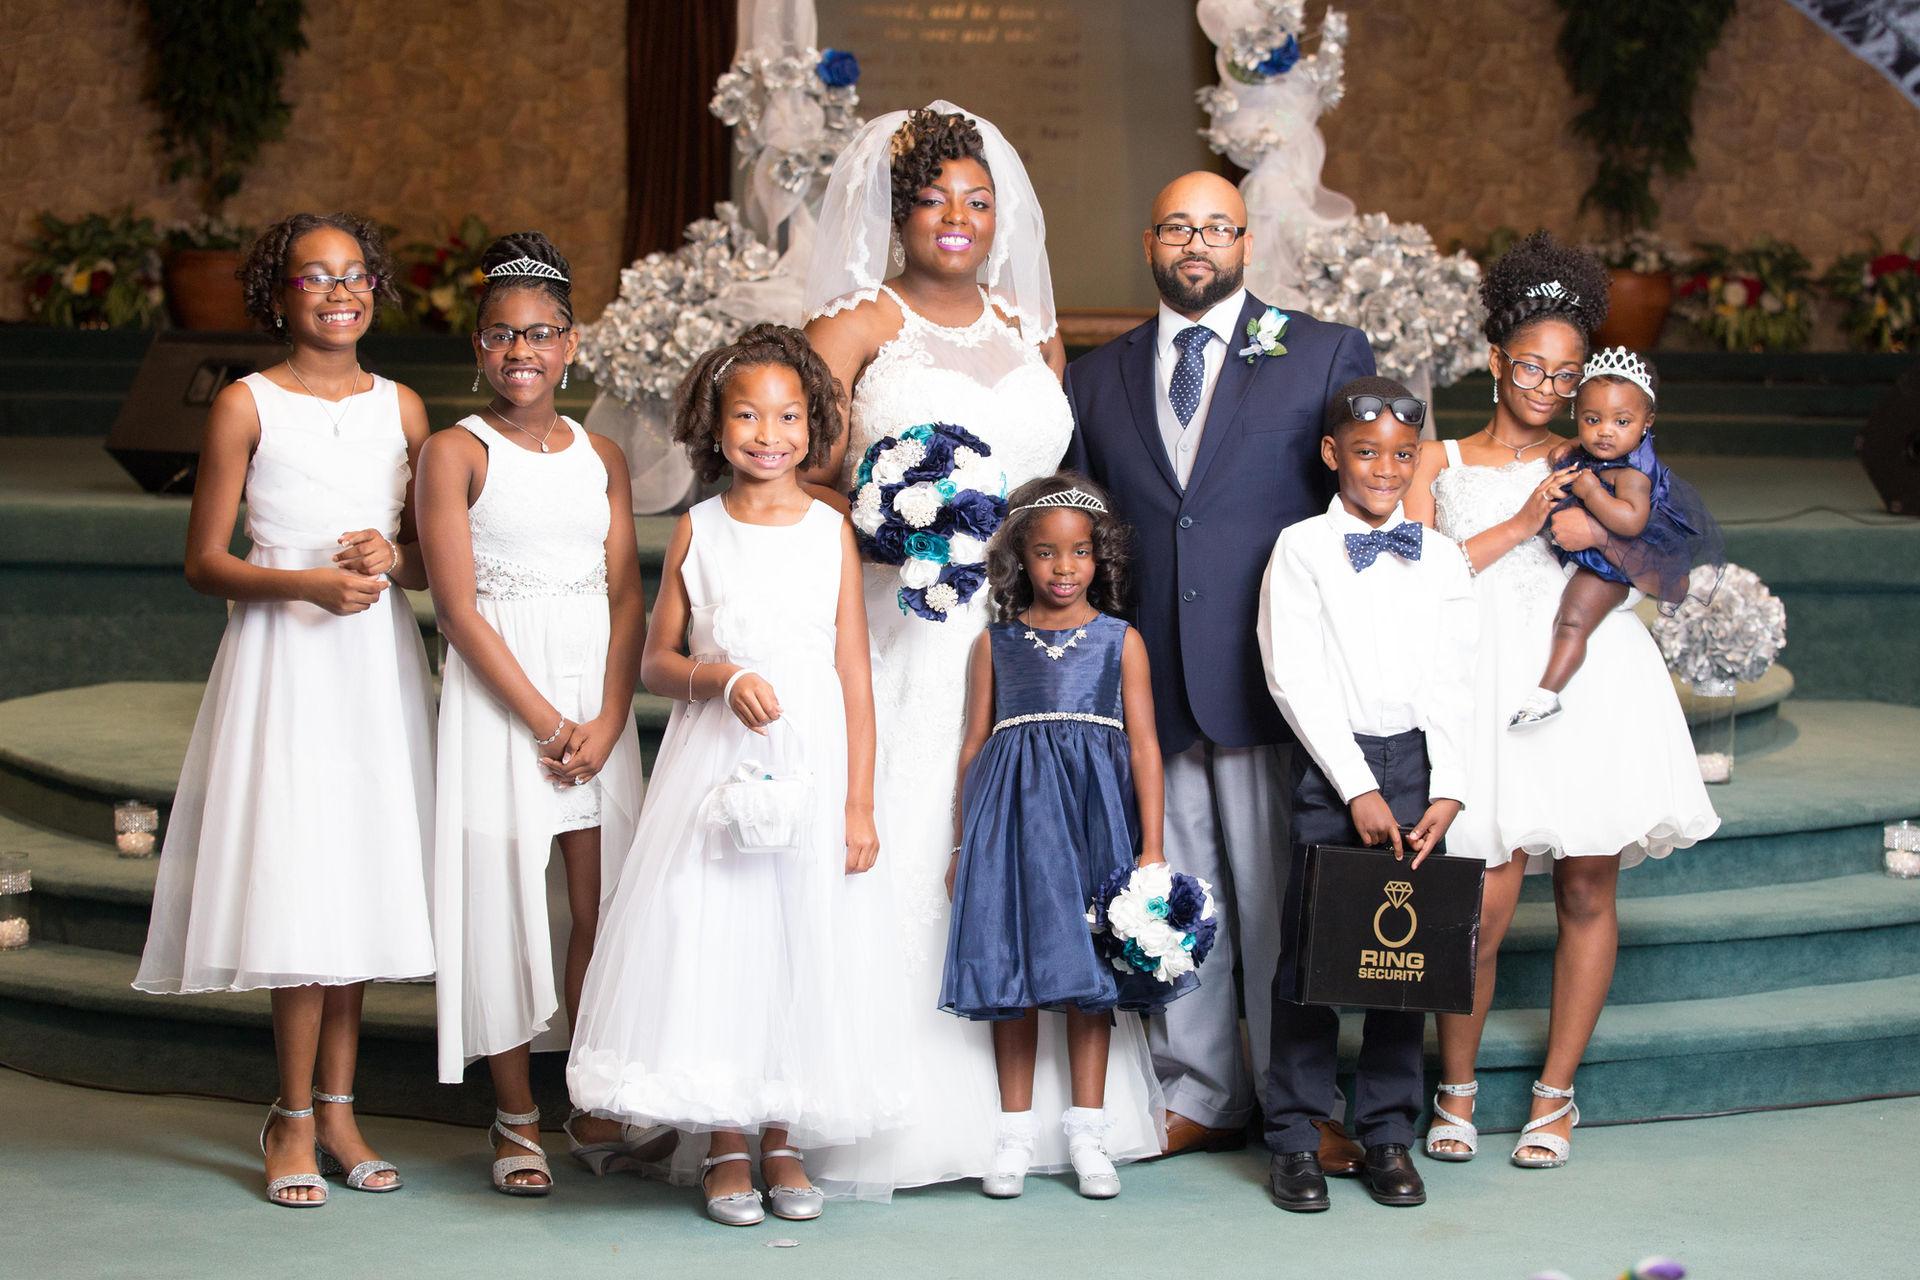 Formal wedding photo session in Richmond, Virginia